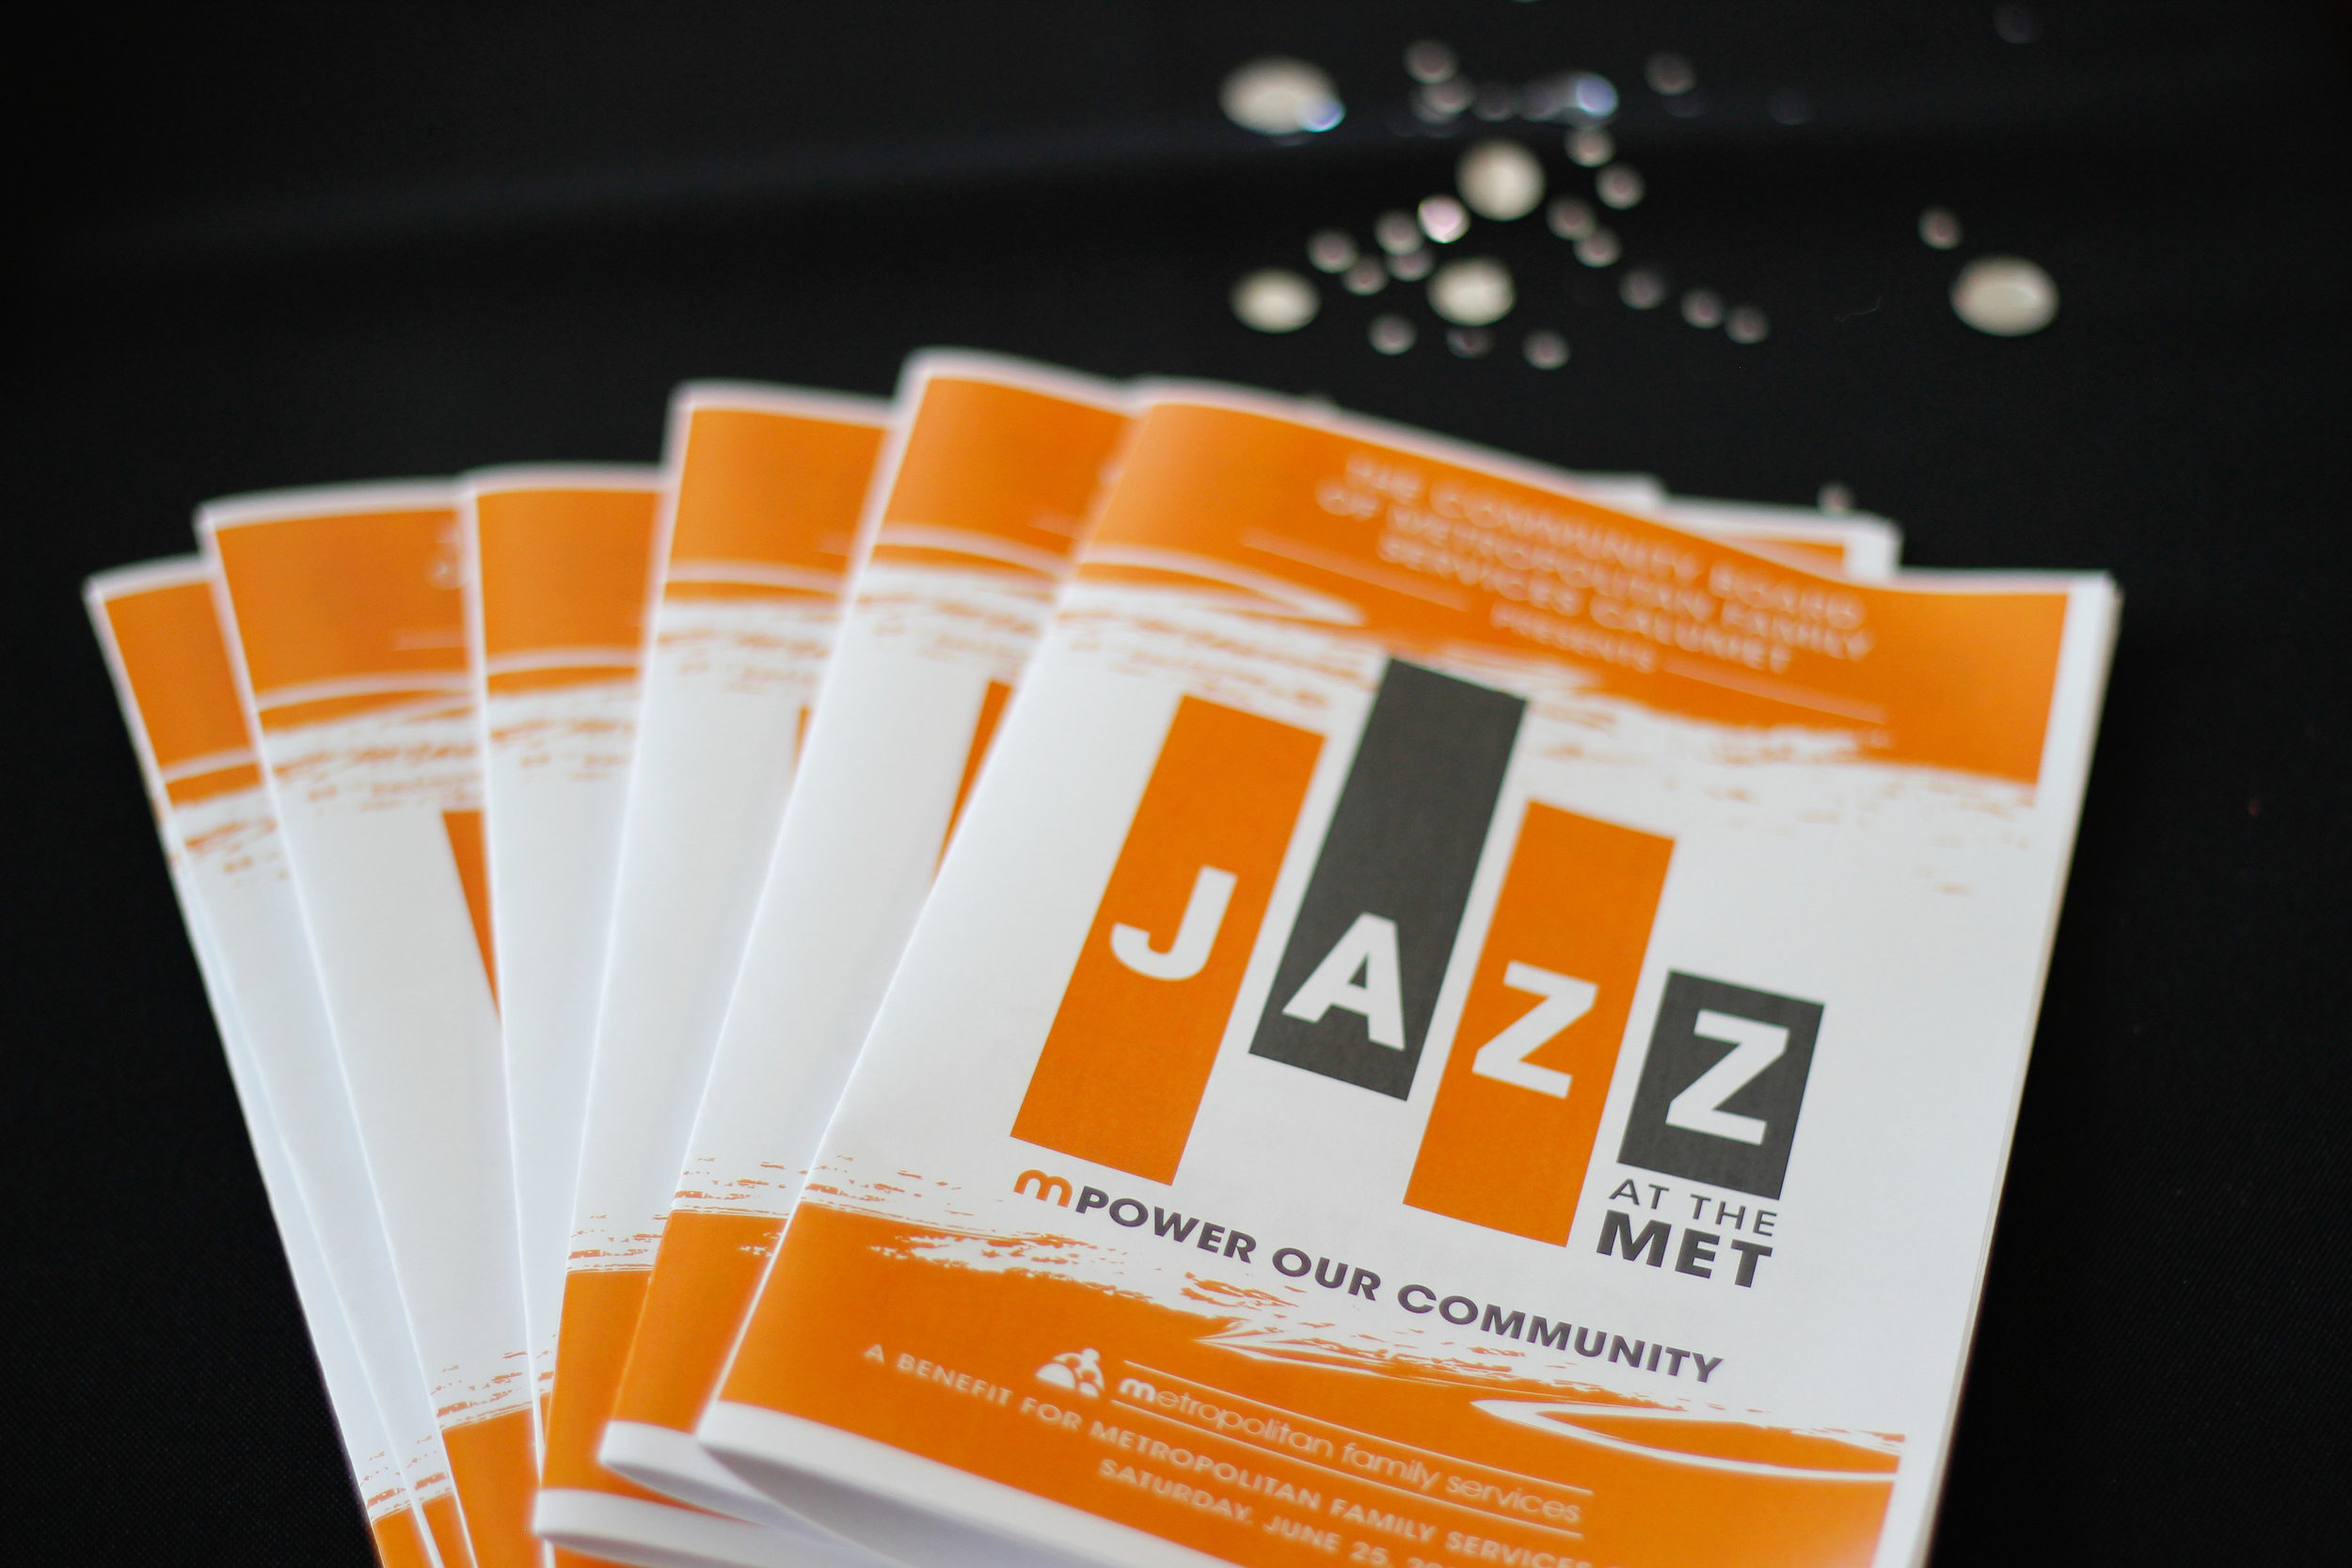 jazzatthemet_2016_0001.jpg